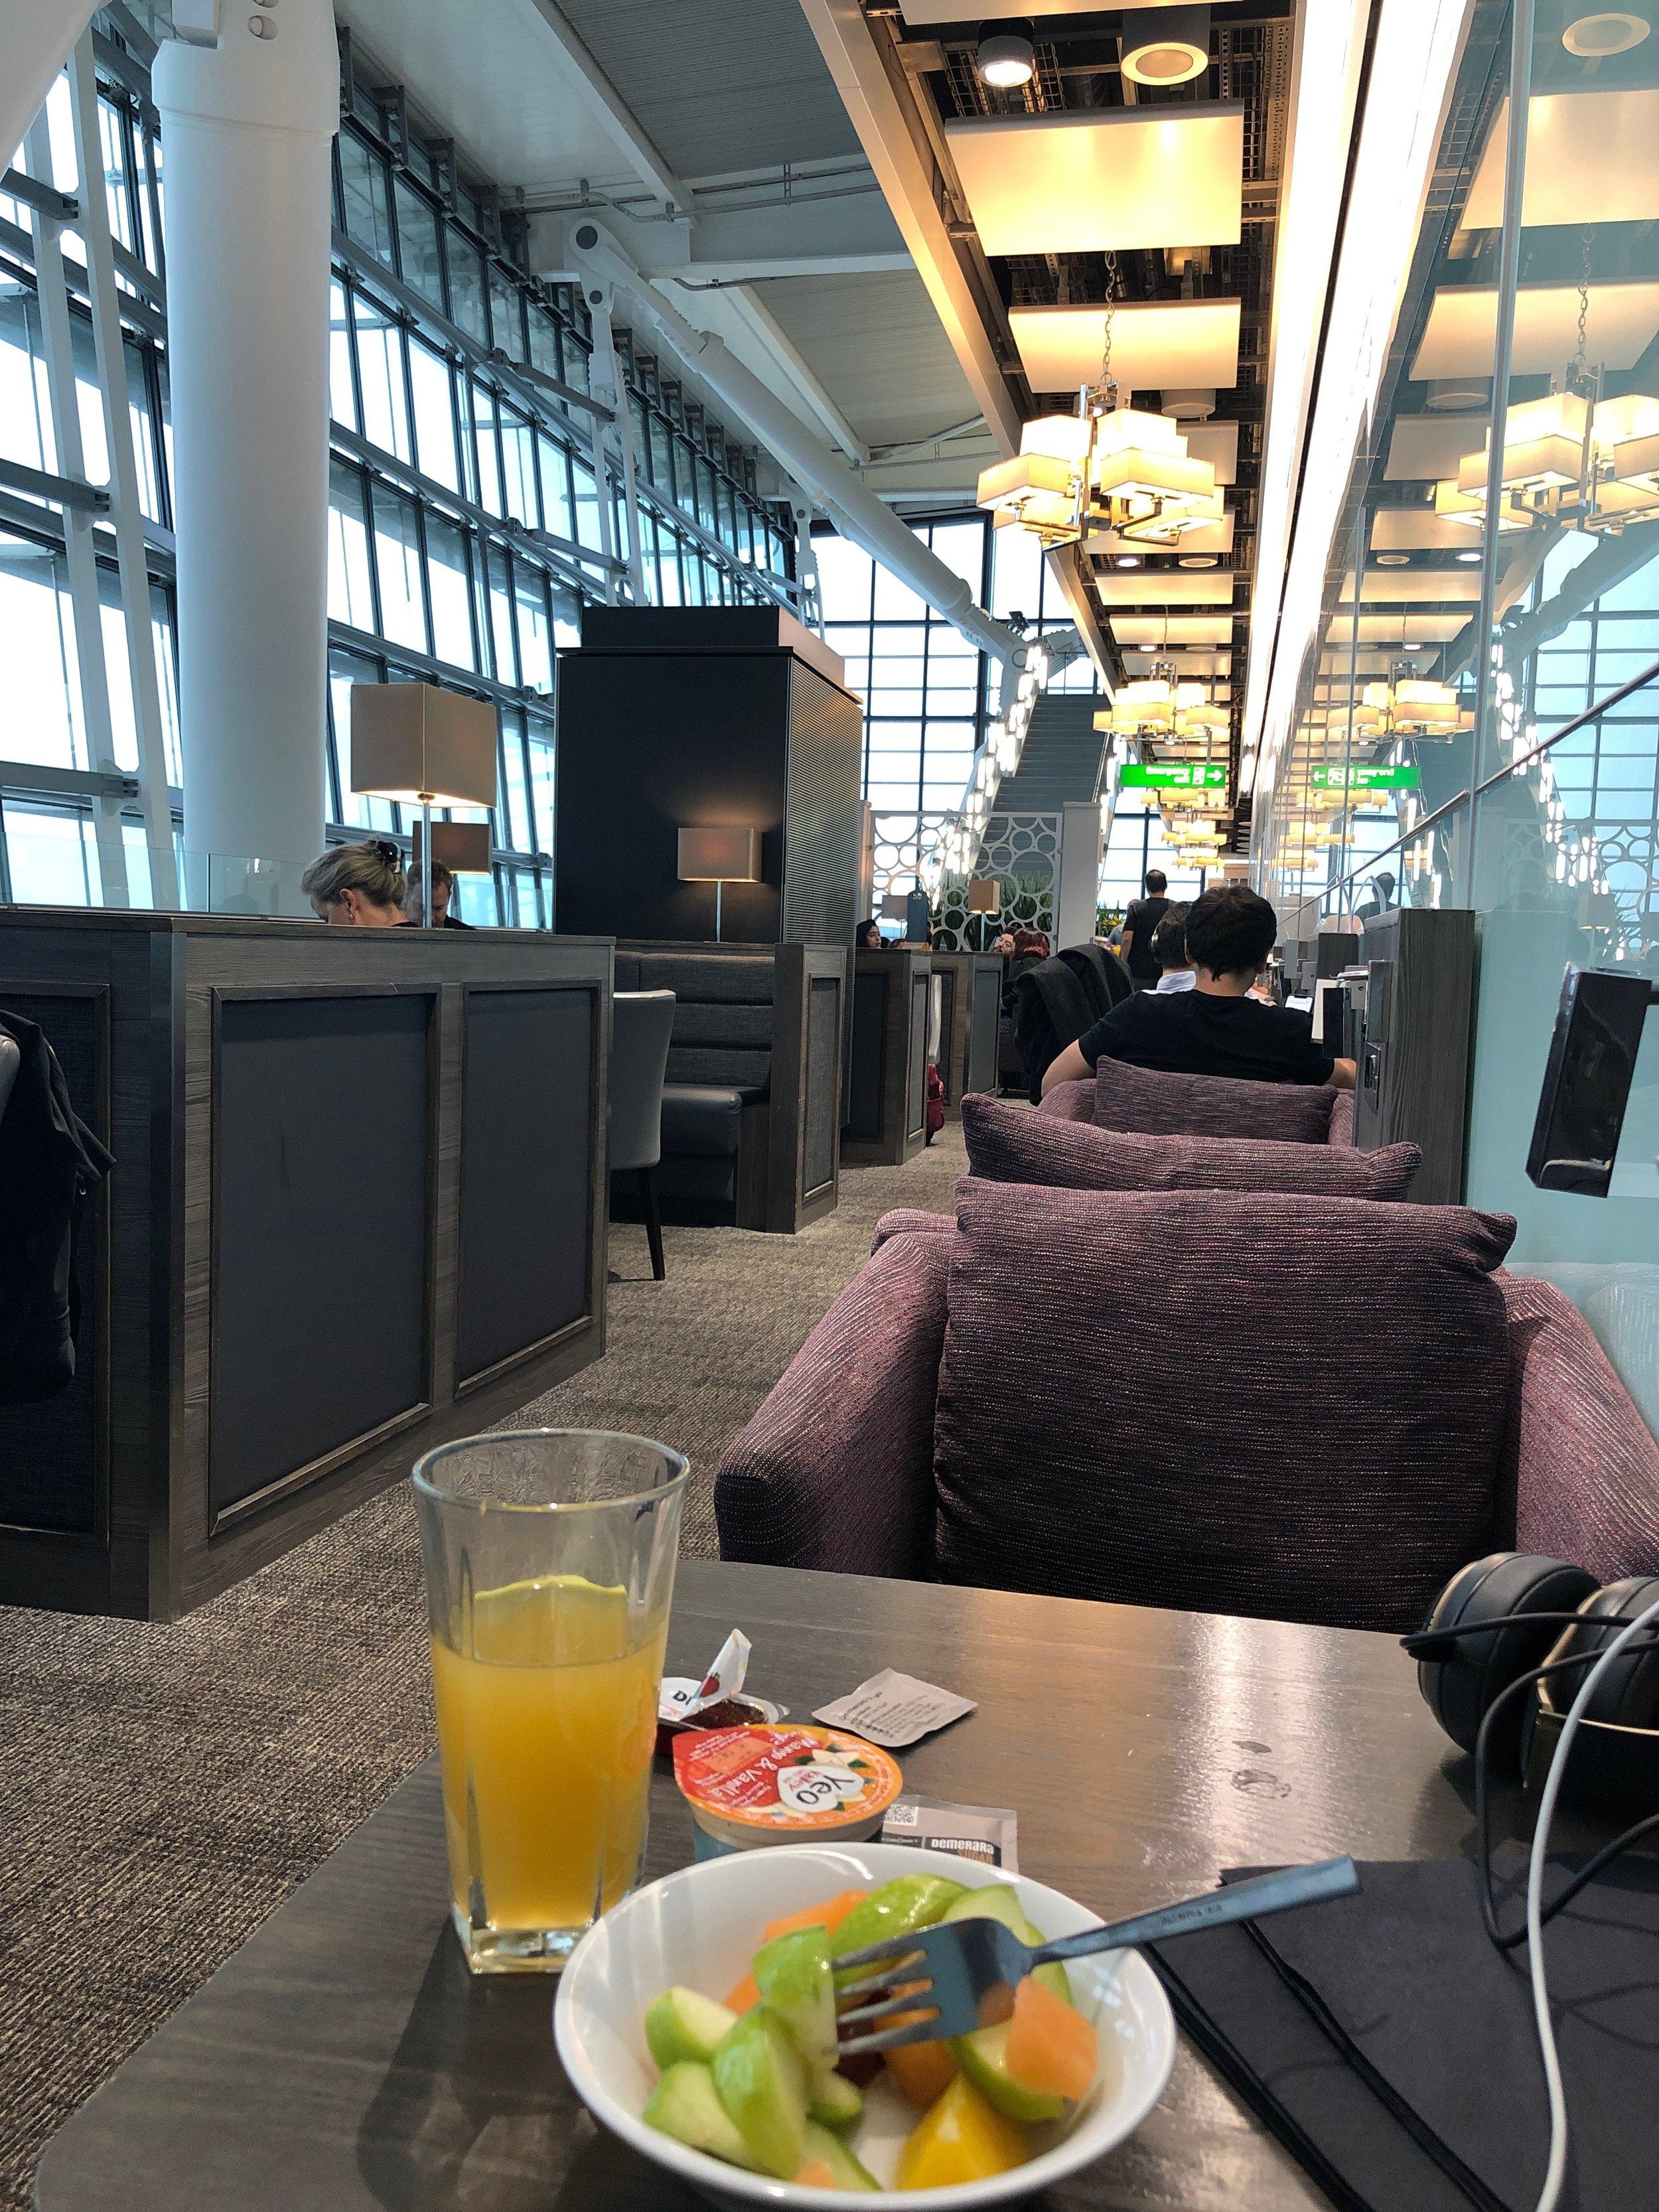 PriorityPass lounge at London Heathrow Airport. Nov. 2018.